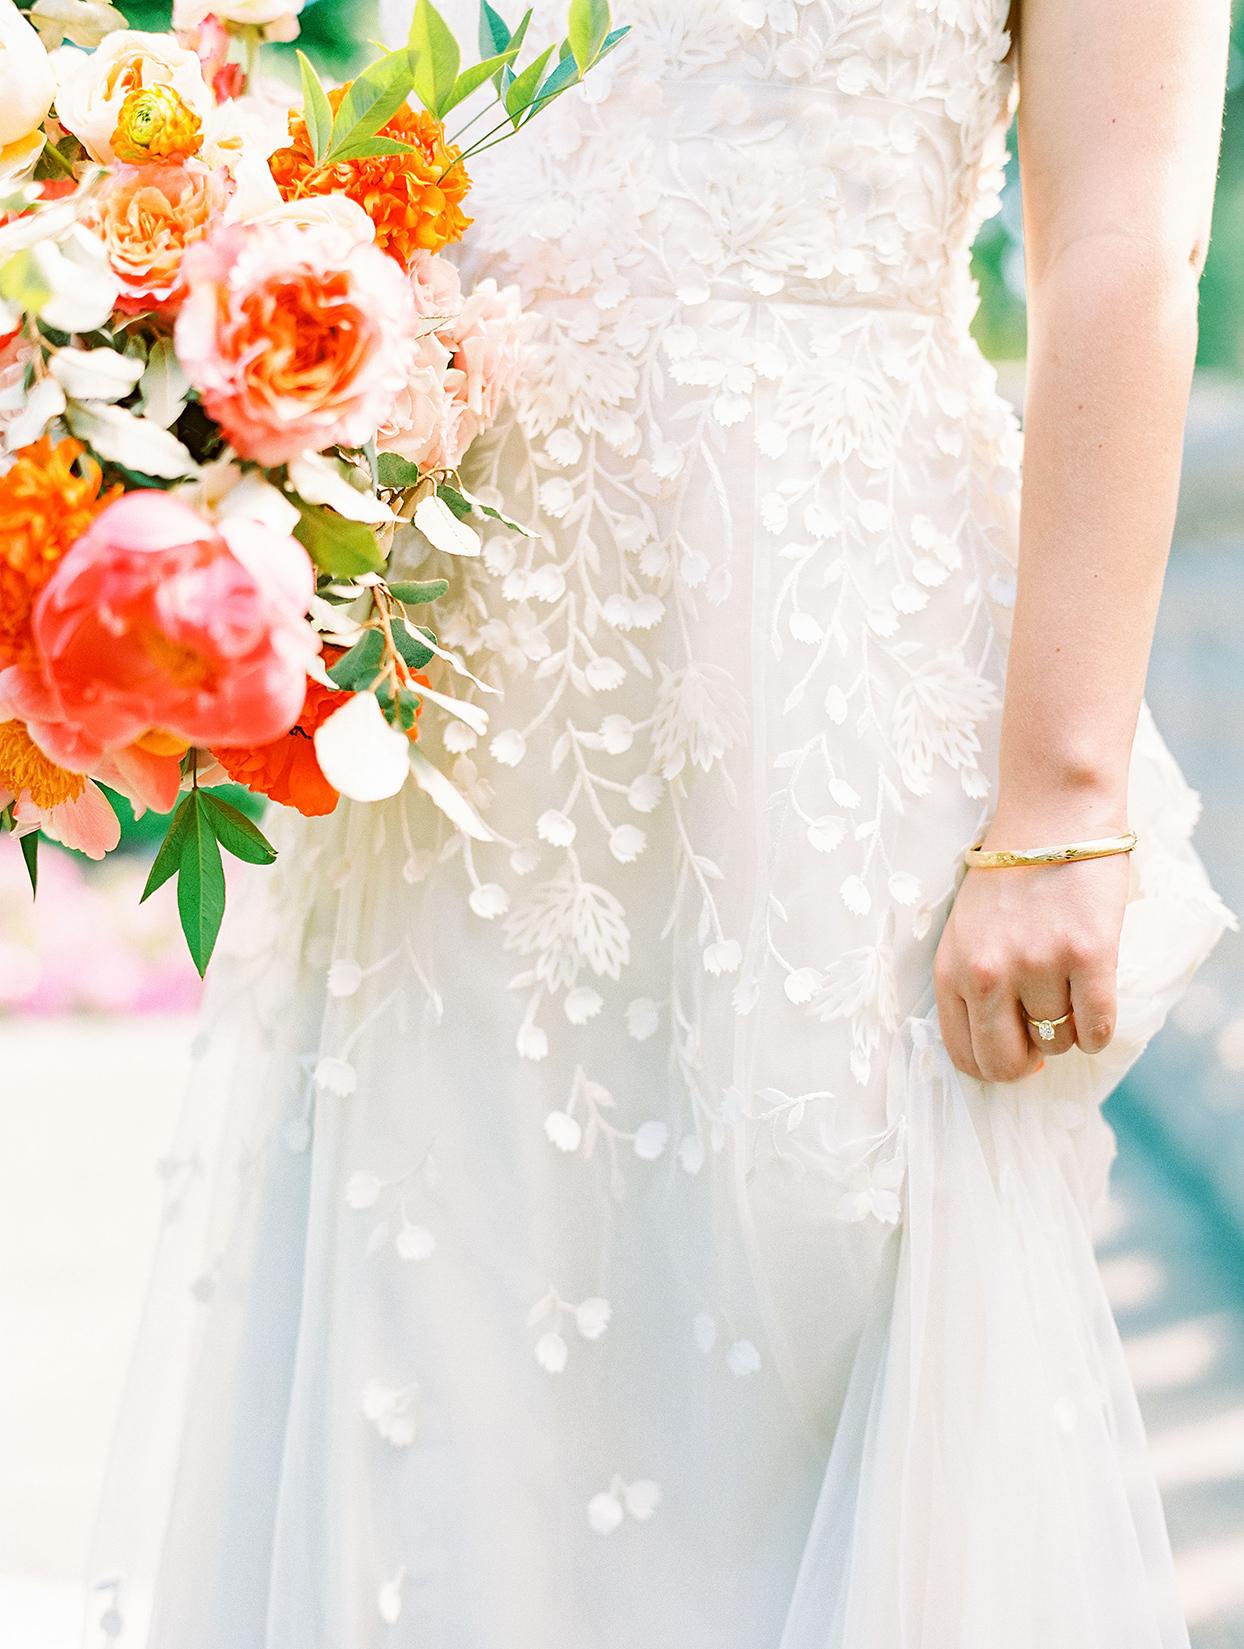 evie joe wedding floral brocade on bride's dress